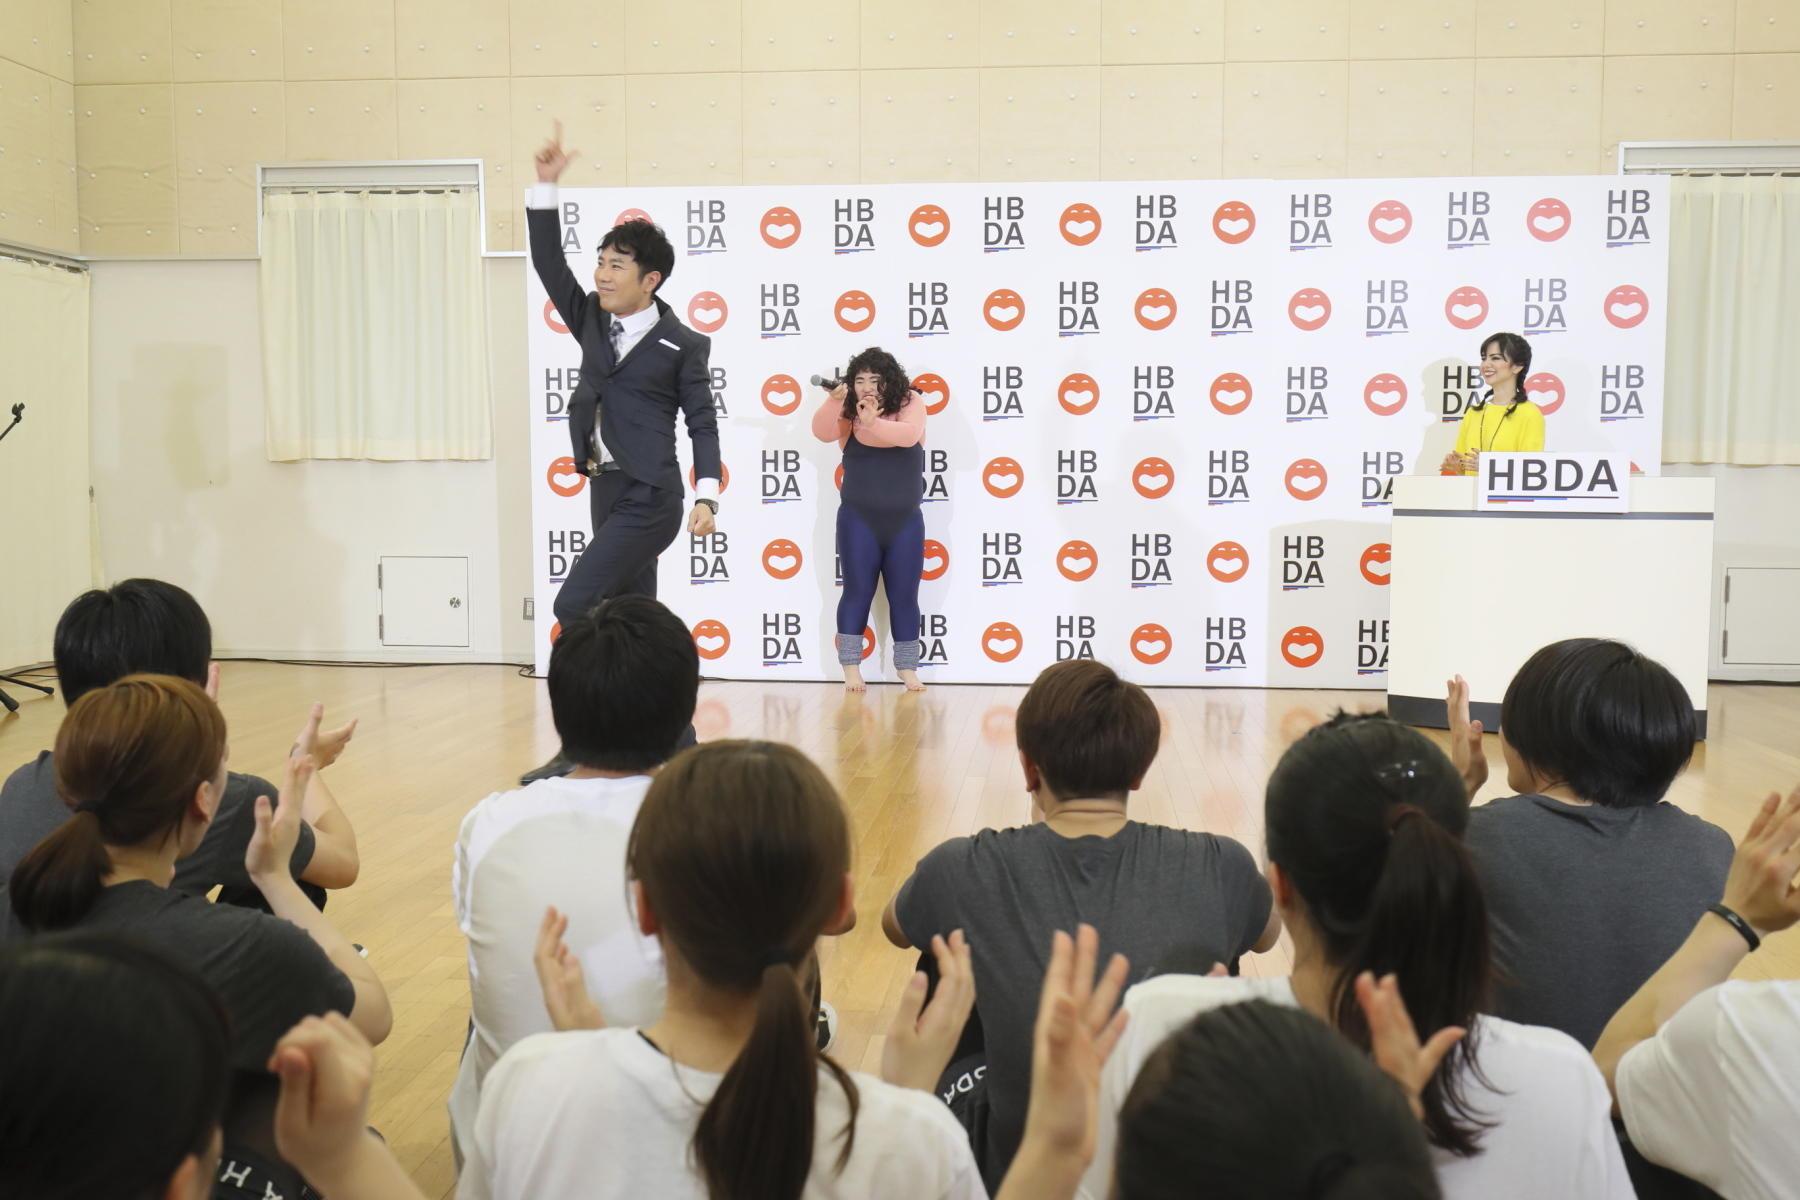 http://news.yoshimoto.co.jp/20170411184534-395355ed8c7407a4c60f32f00456be8e77e7e0fe.jpg